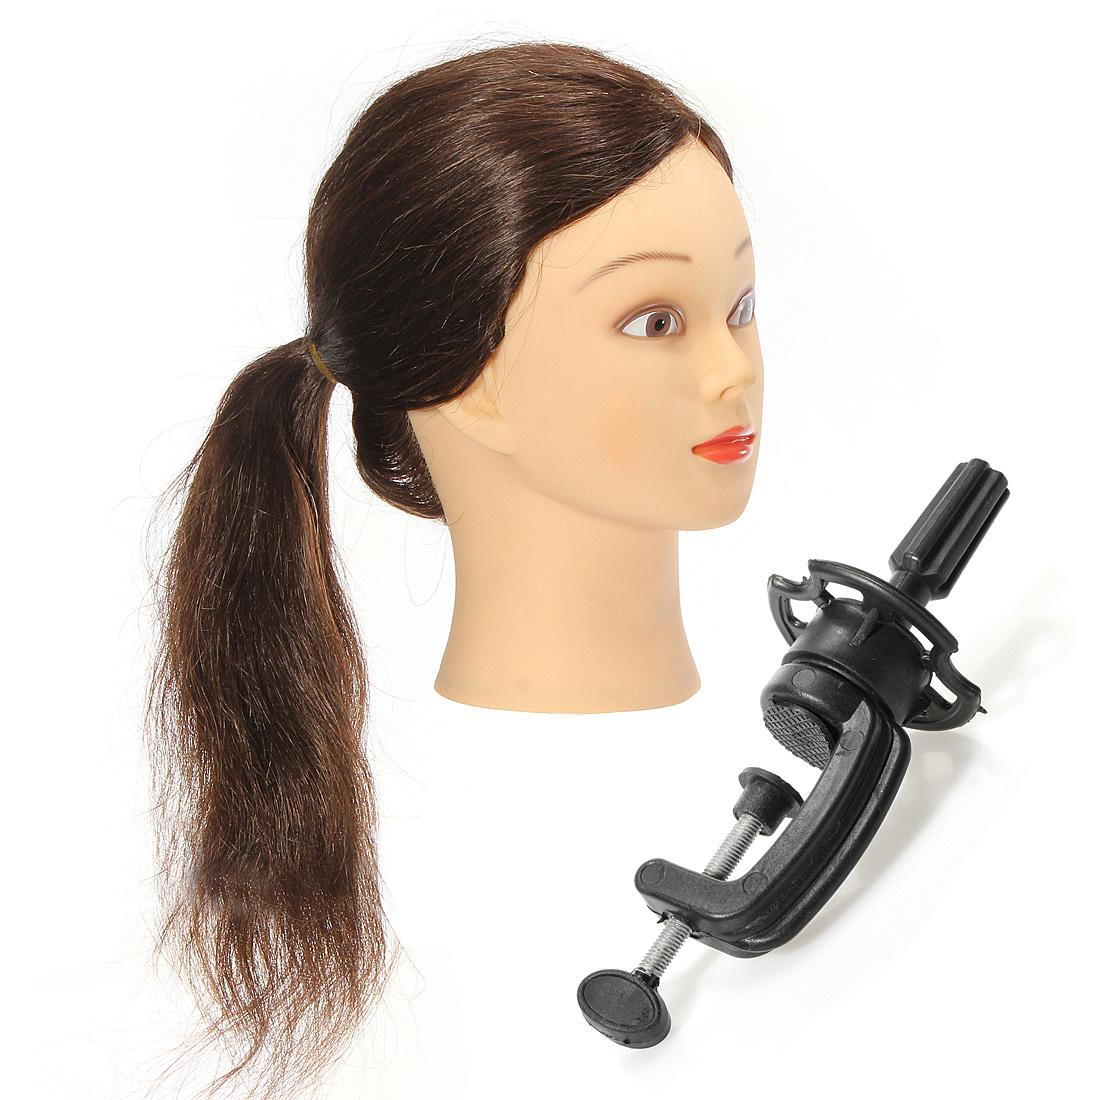 80 Percent Human Hair Hairdressing Training Head Practi